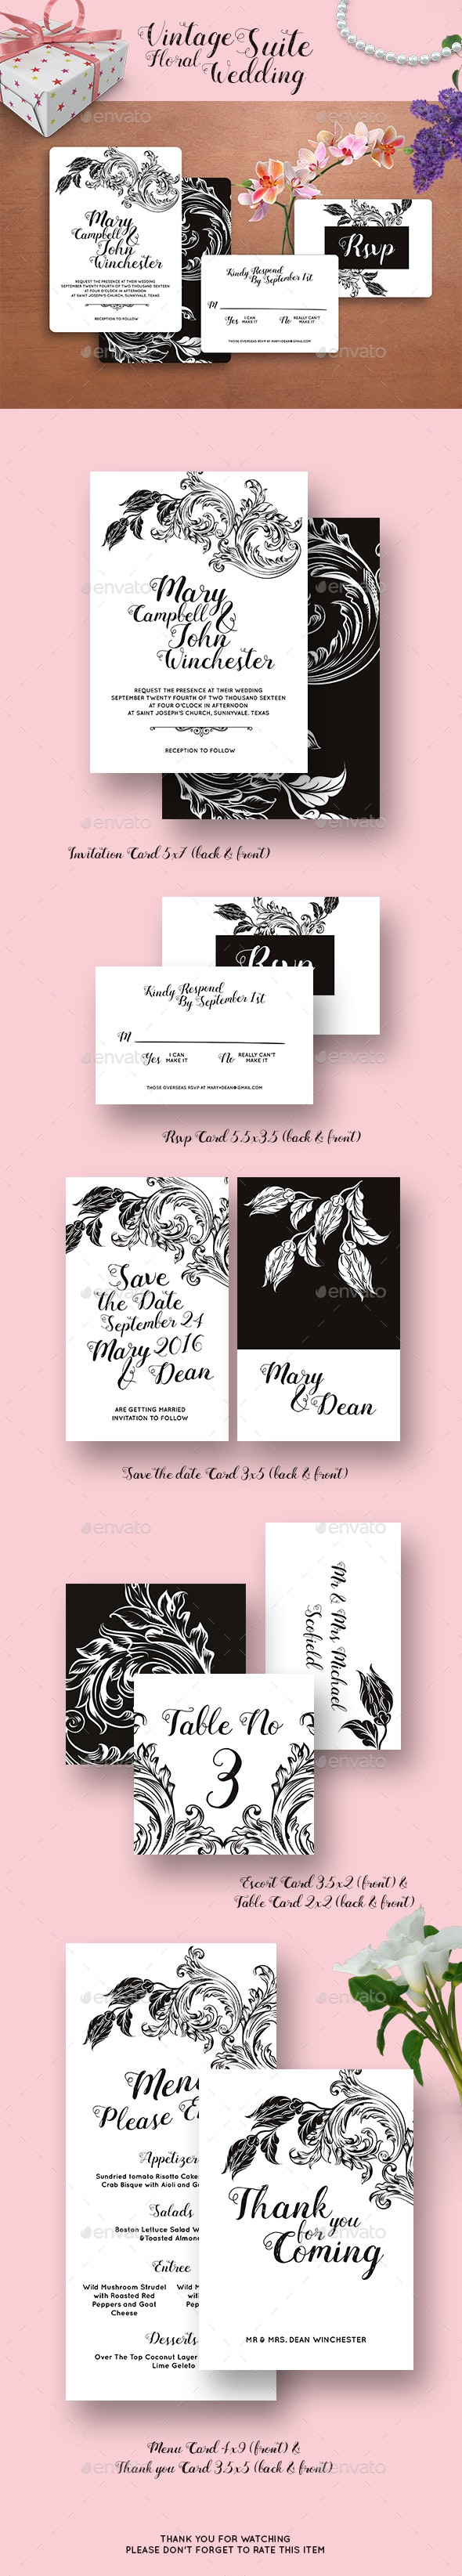 Vintage Floral Wedding Invitation Suite - Weddings Cards & Invites